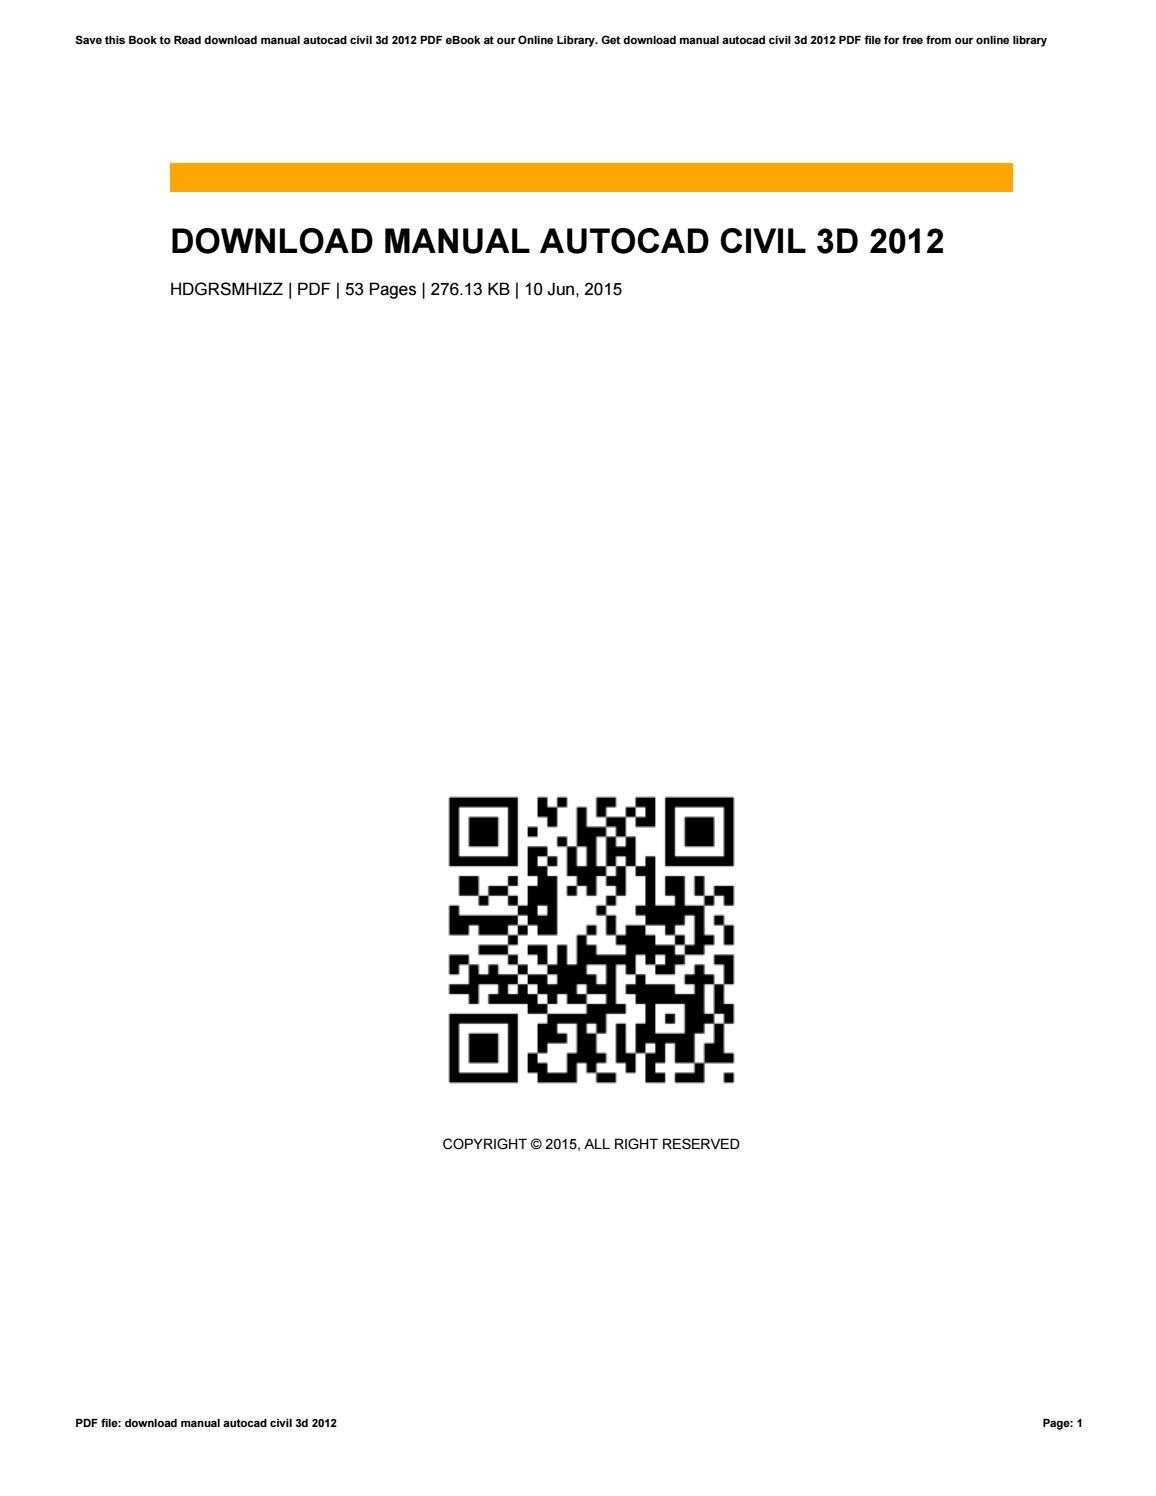 Autocad civil 3d 2012 32 bit free download-adds.